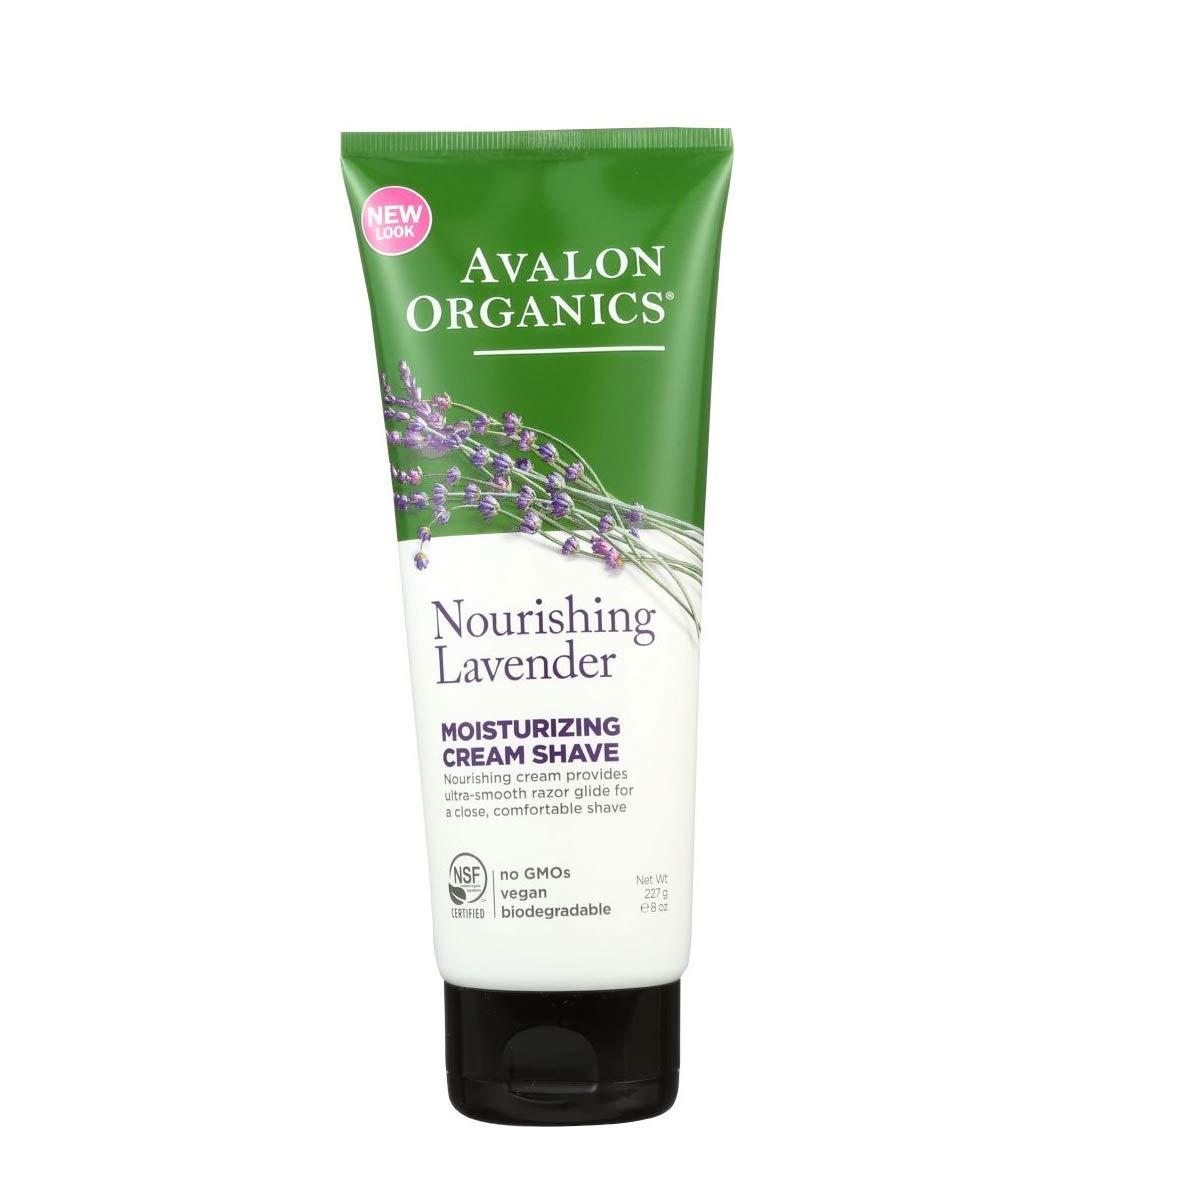 Avalon - Organics Moisturizing Cream Shave - Lavender (8 oz.) 1 pcs sku# 1900108MA